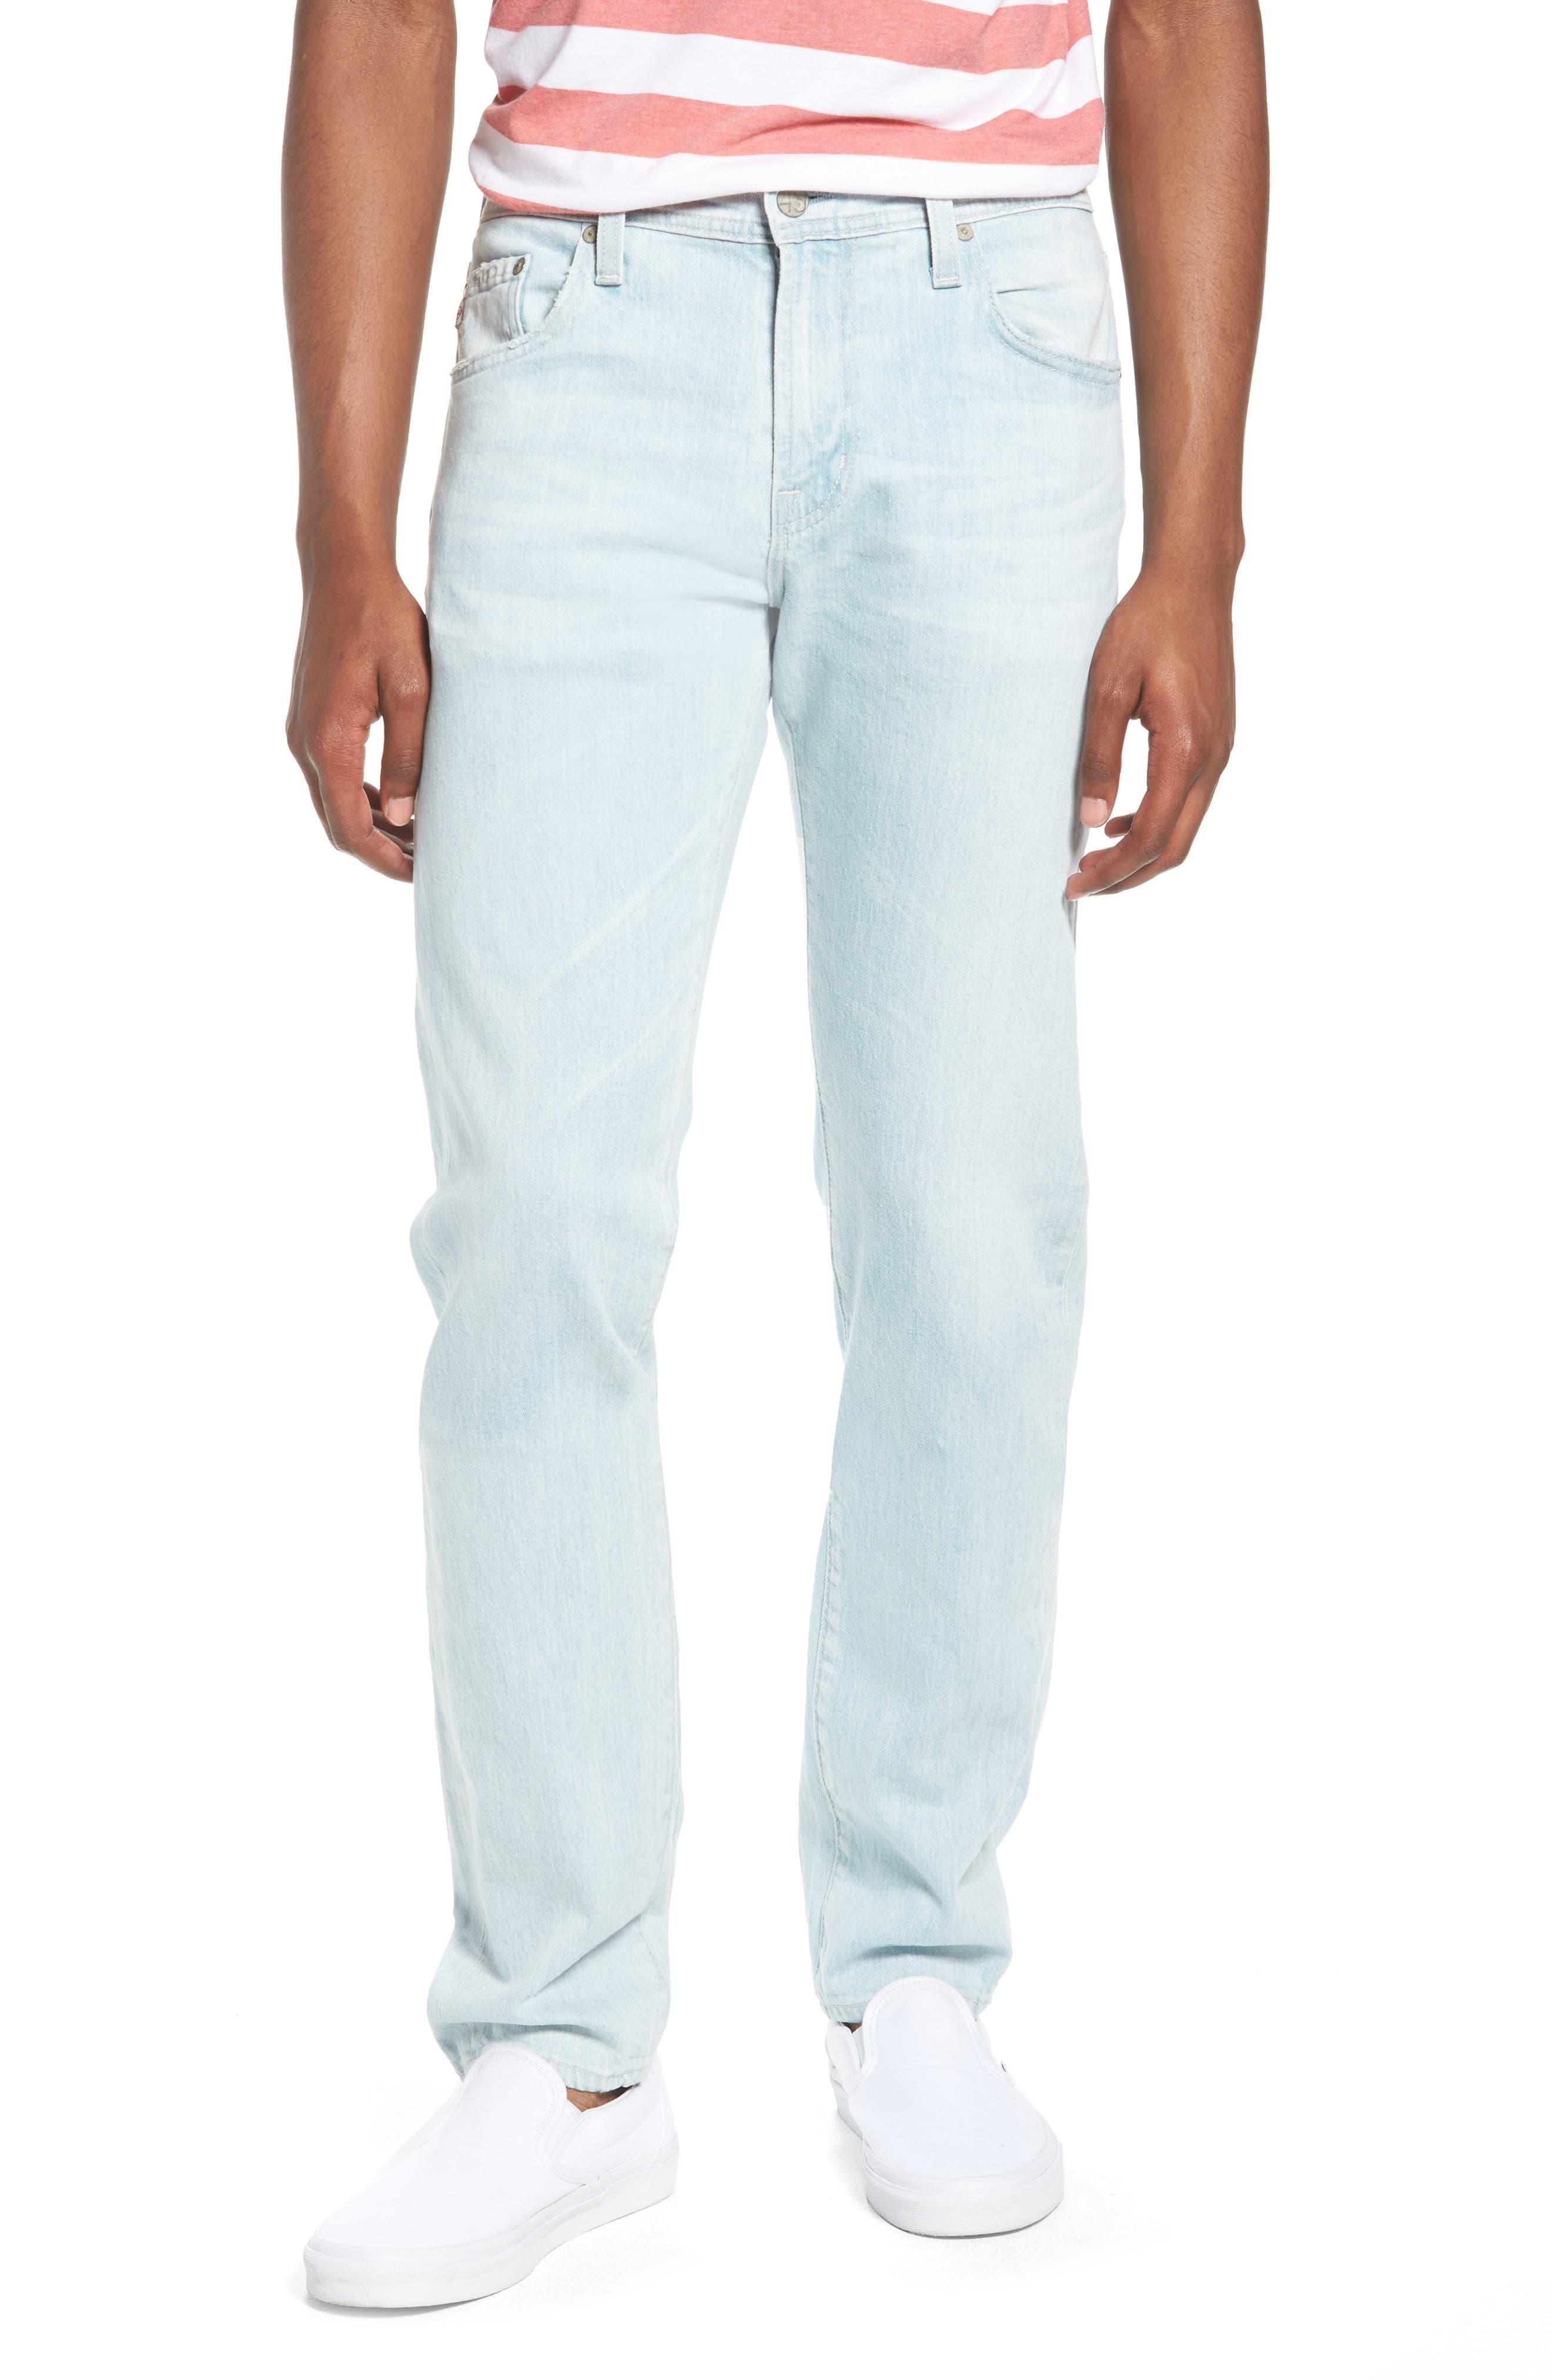 Dylan Skinny Fit Jeans,                         Main,                         color, 28 Years Salt Mist